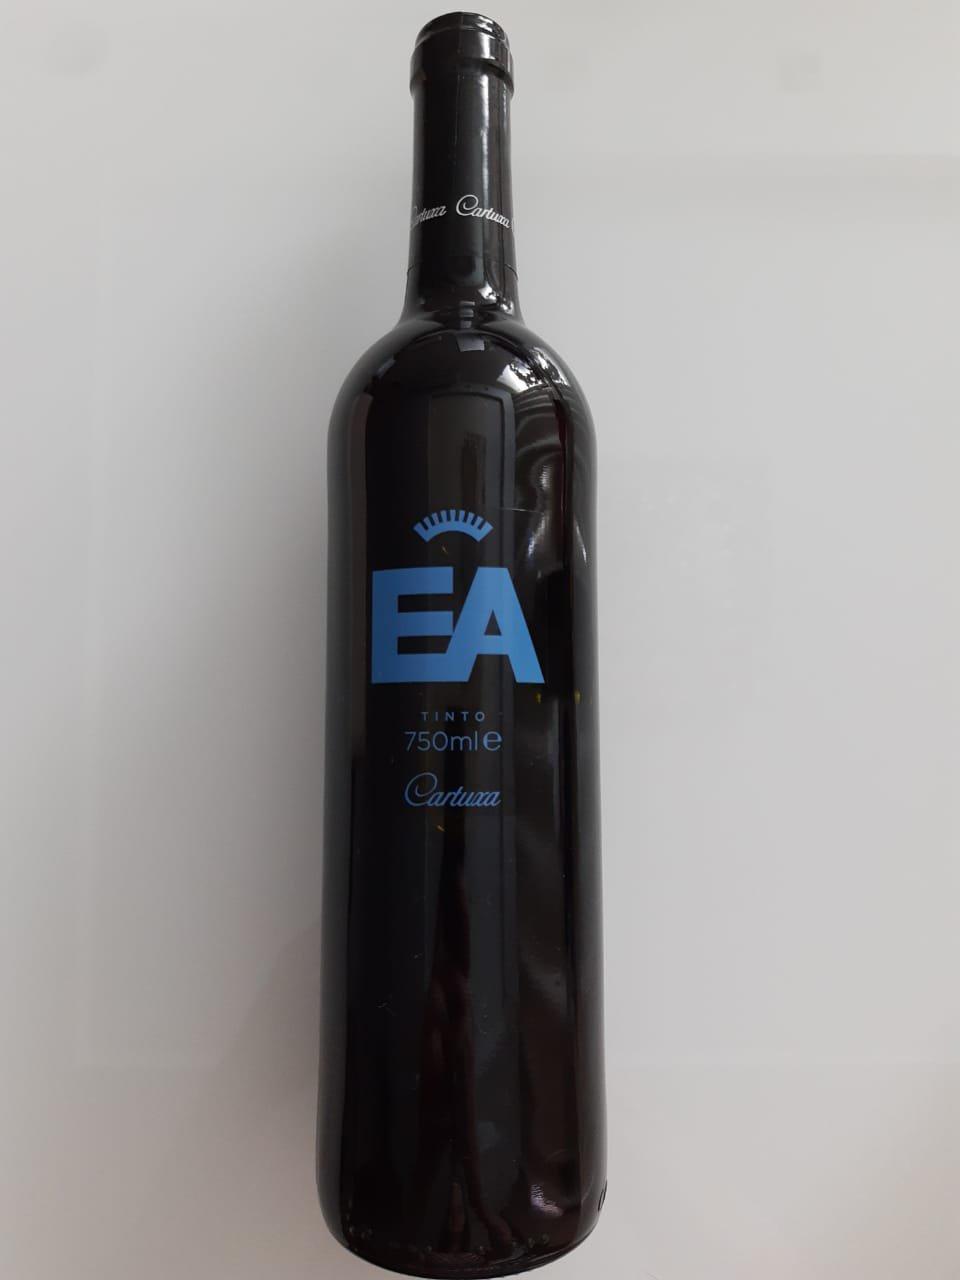 Vinho EA Cartuxa Tinto 750ml